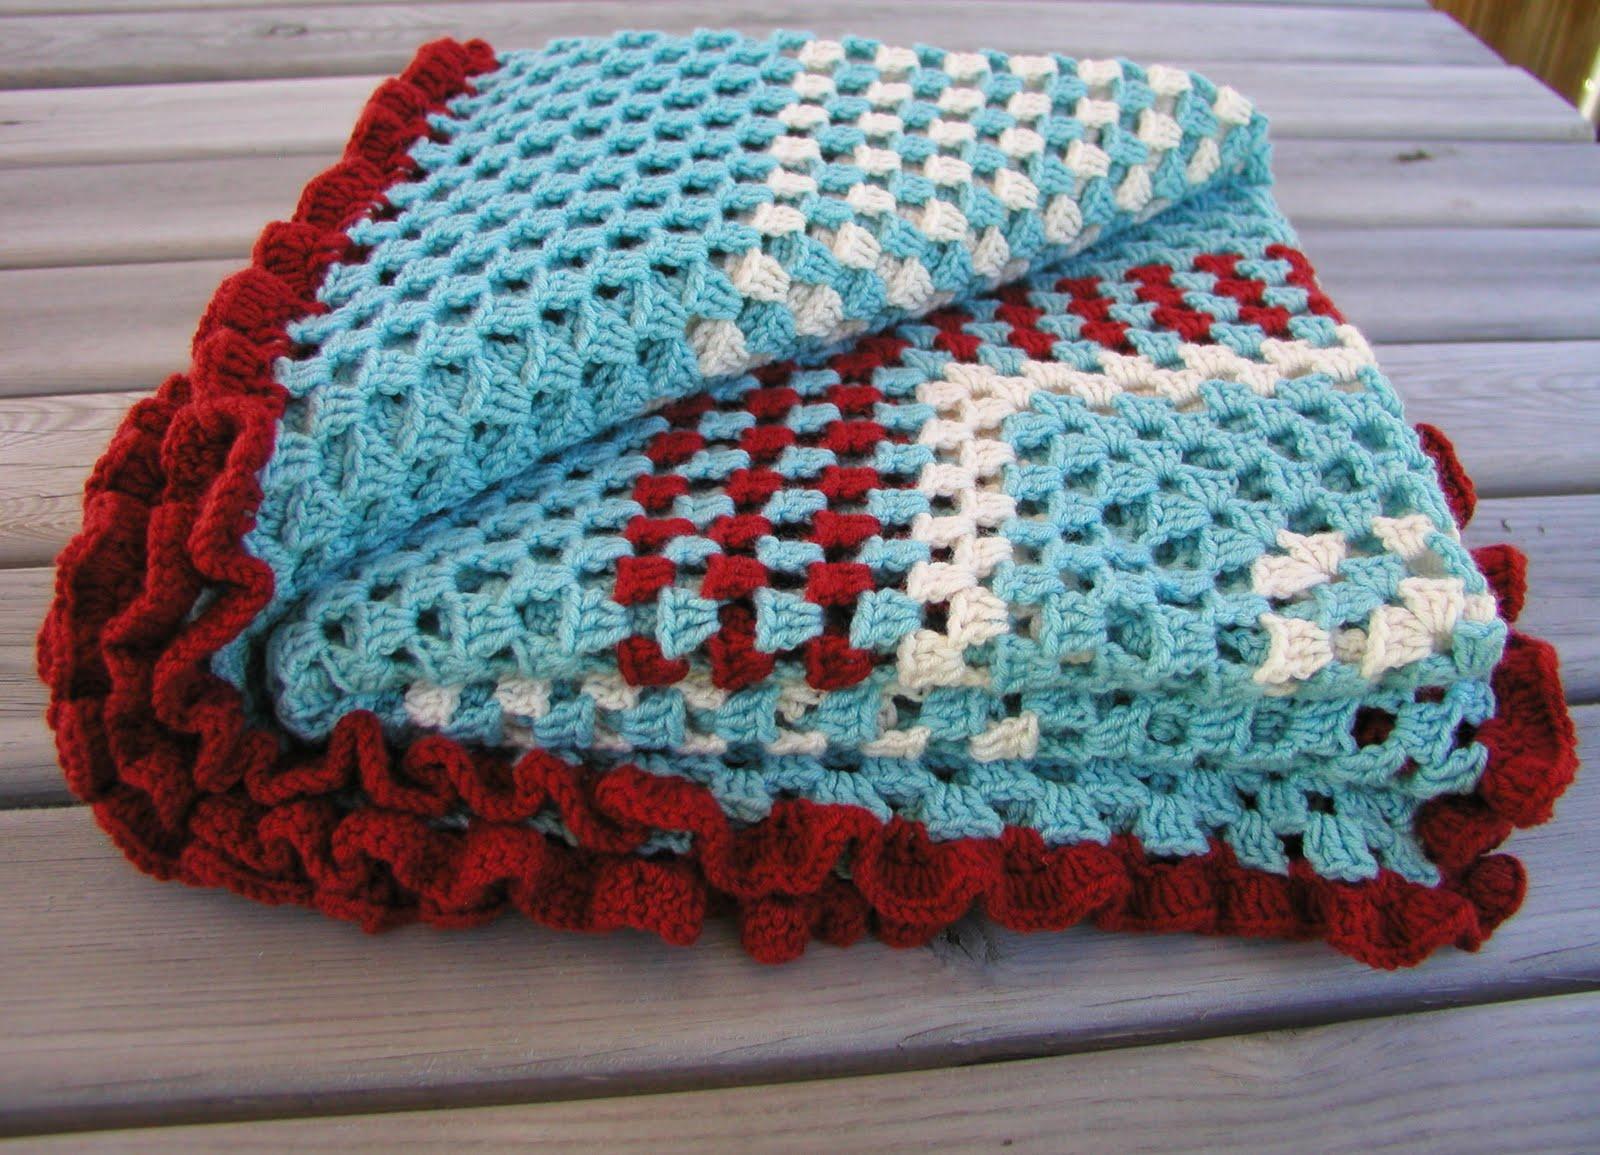 crochet blankets - ShopWiki